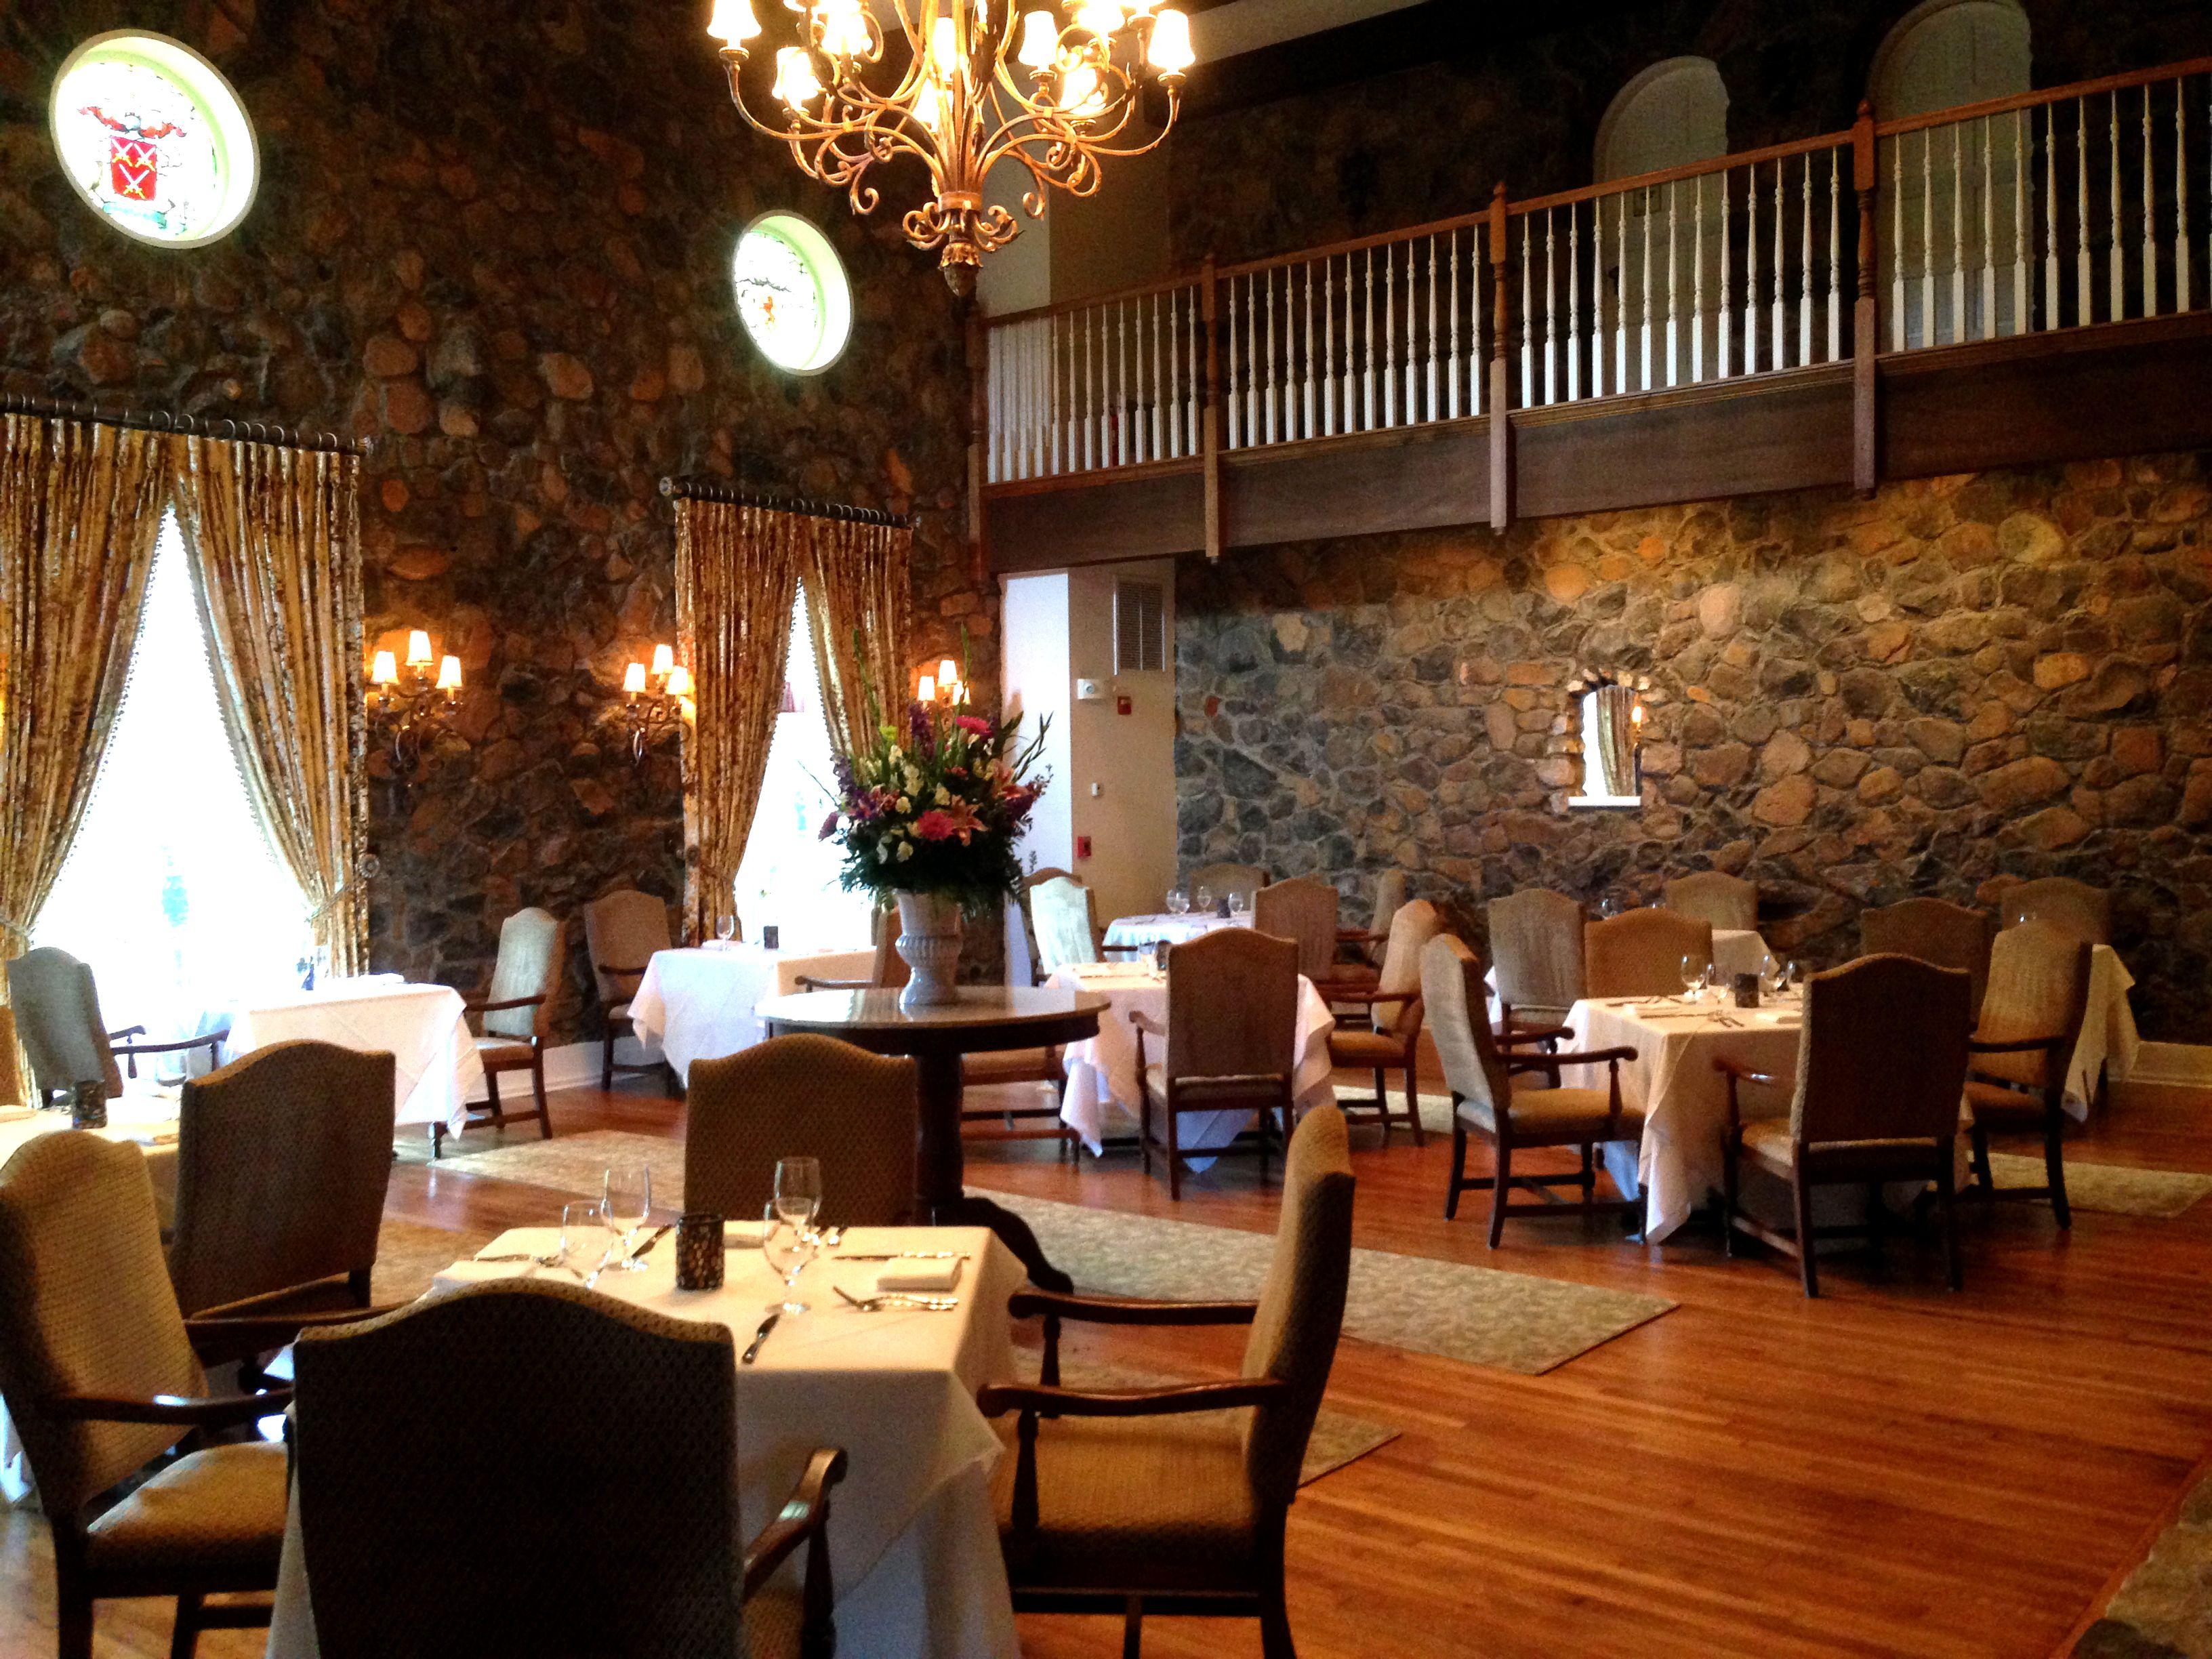 Poplar Springs Inn Spa And Manor House Restaurant